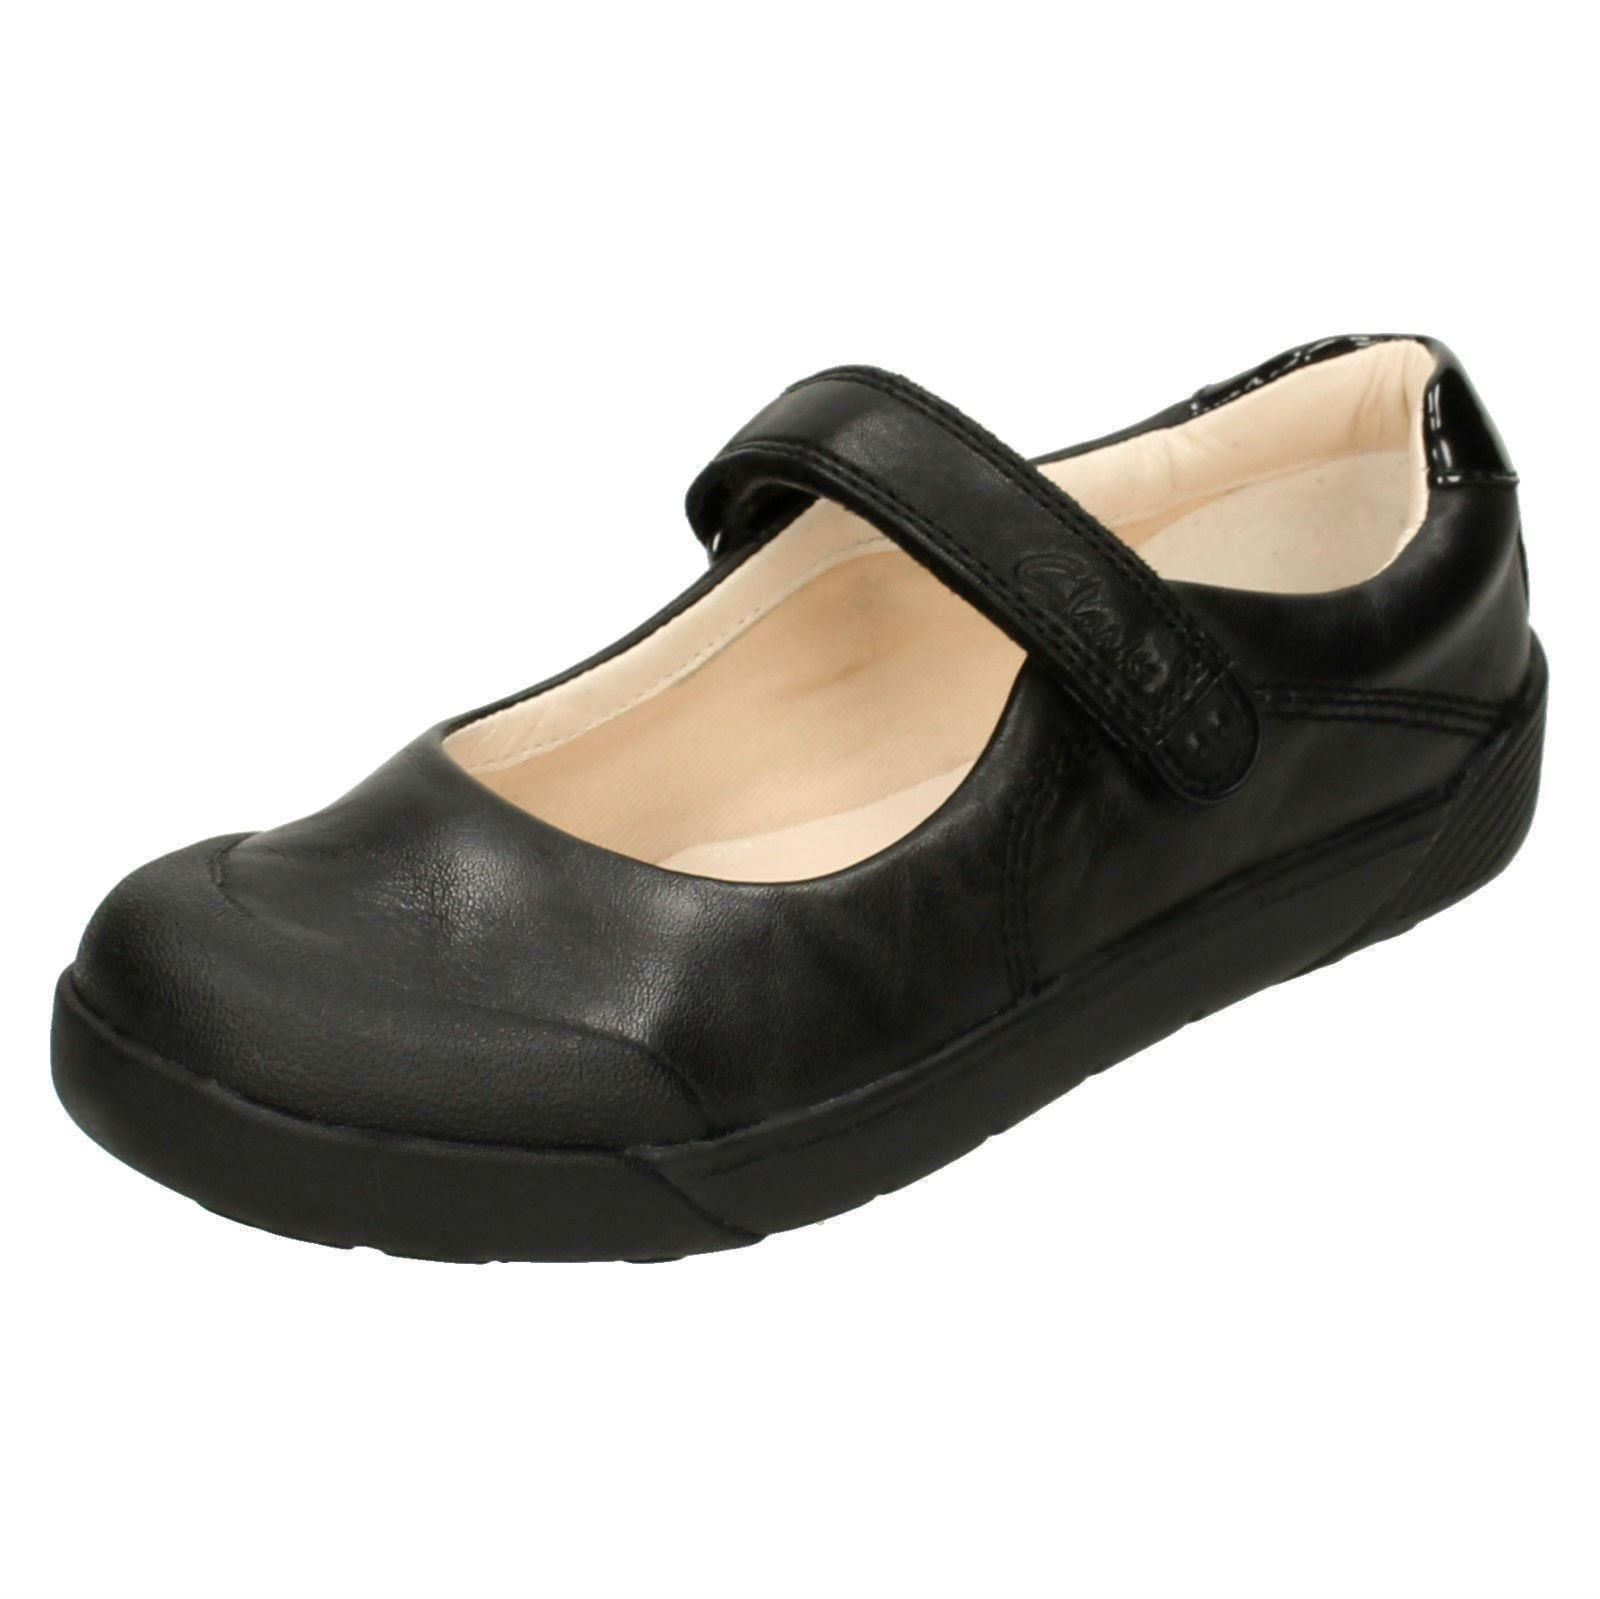 Mary Para De Jane Junior Infantil Niñas Zapatos Clarks Piel twAnPqp